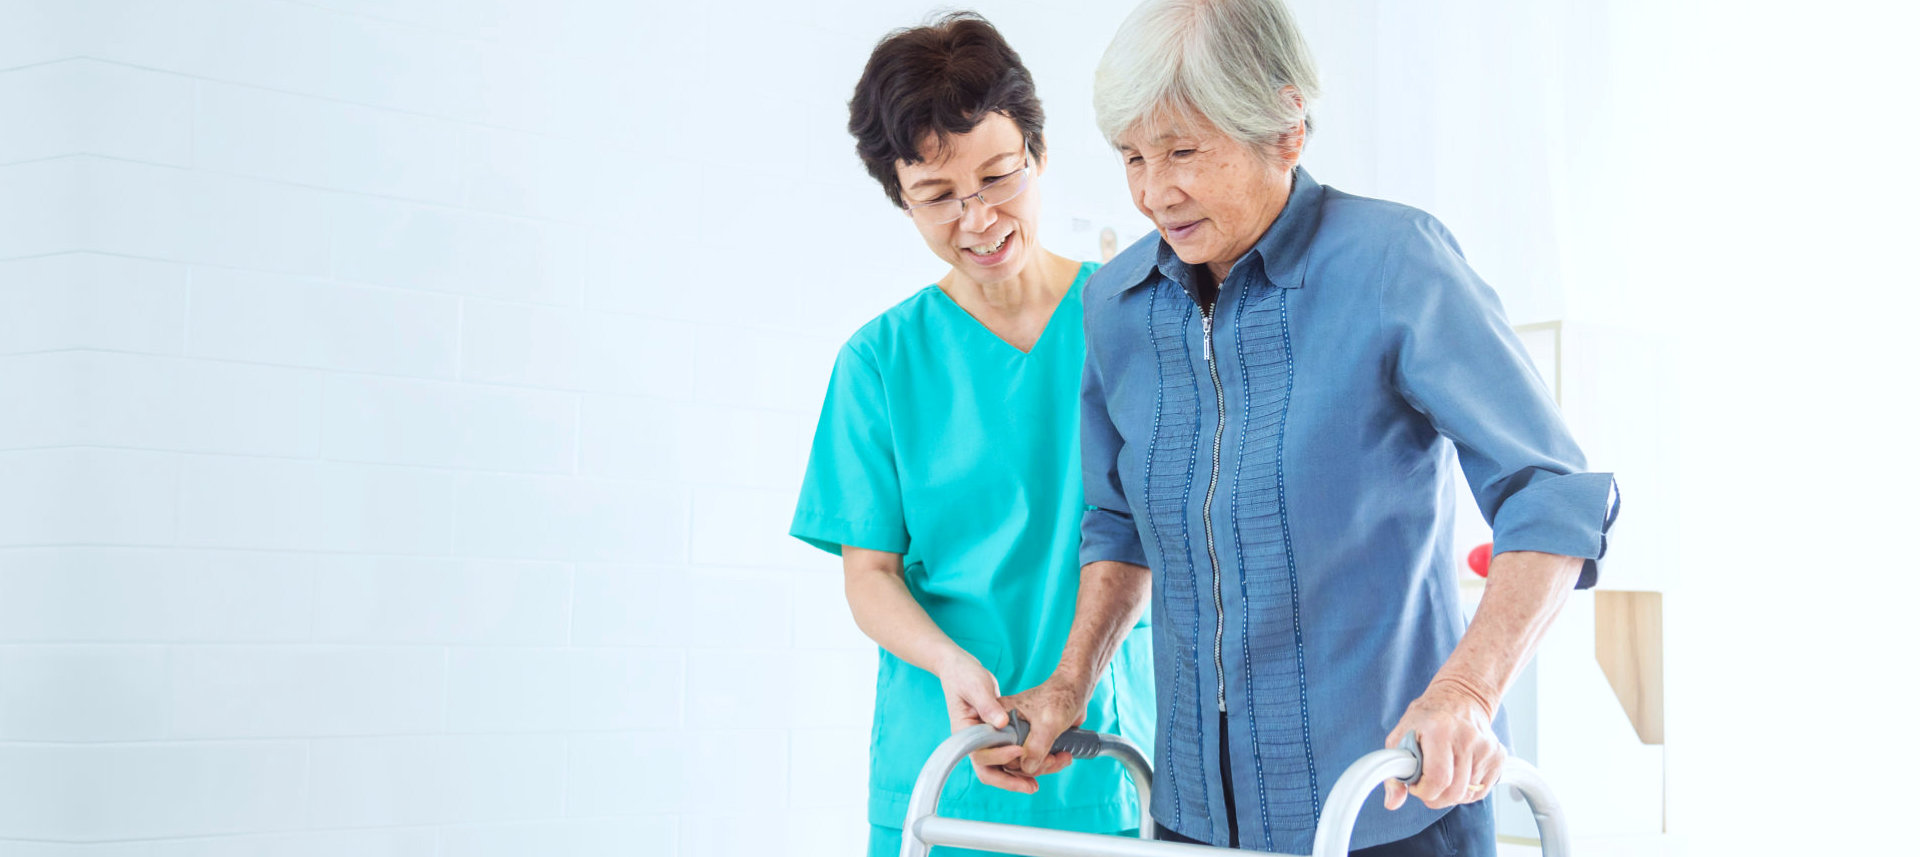 female caregiver assisting senior woman to walk indoor